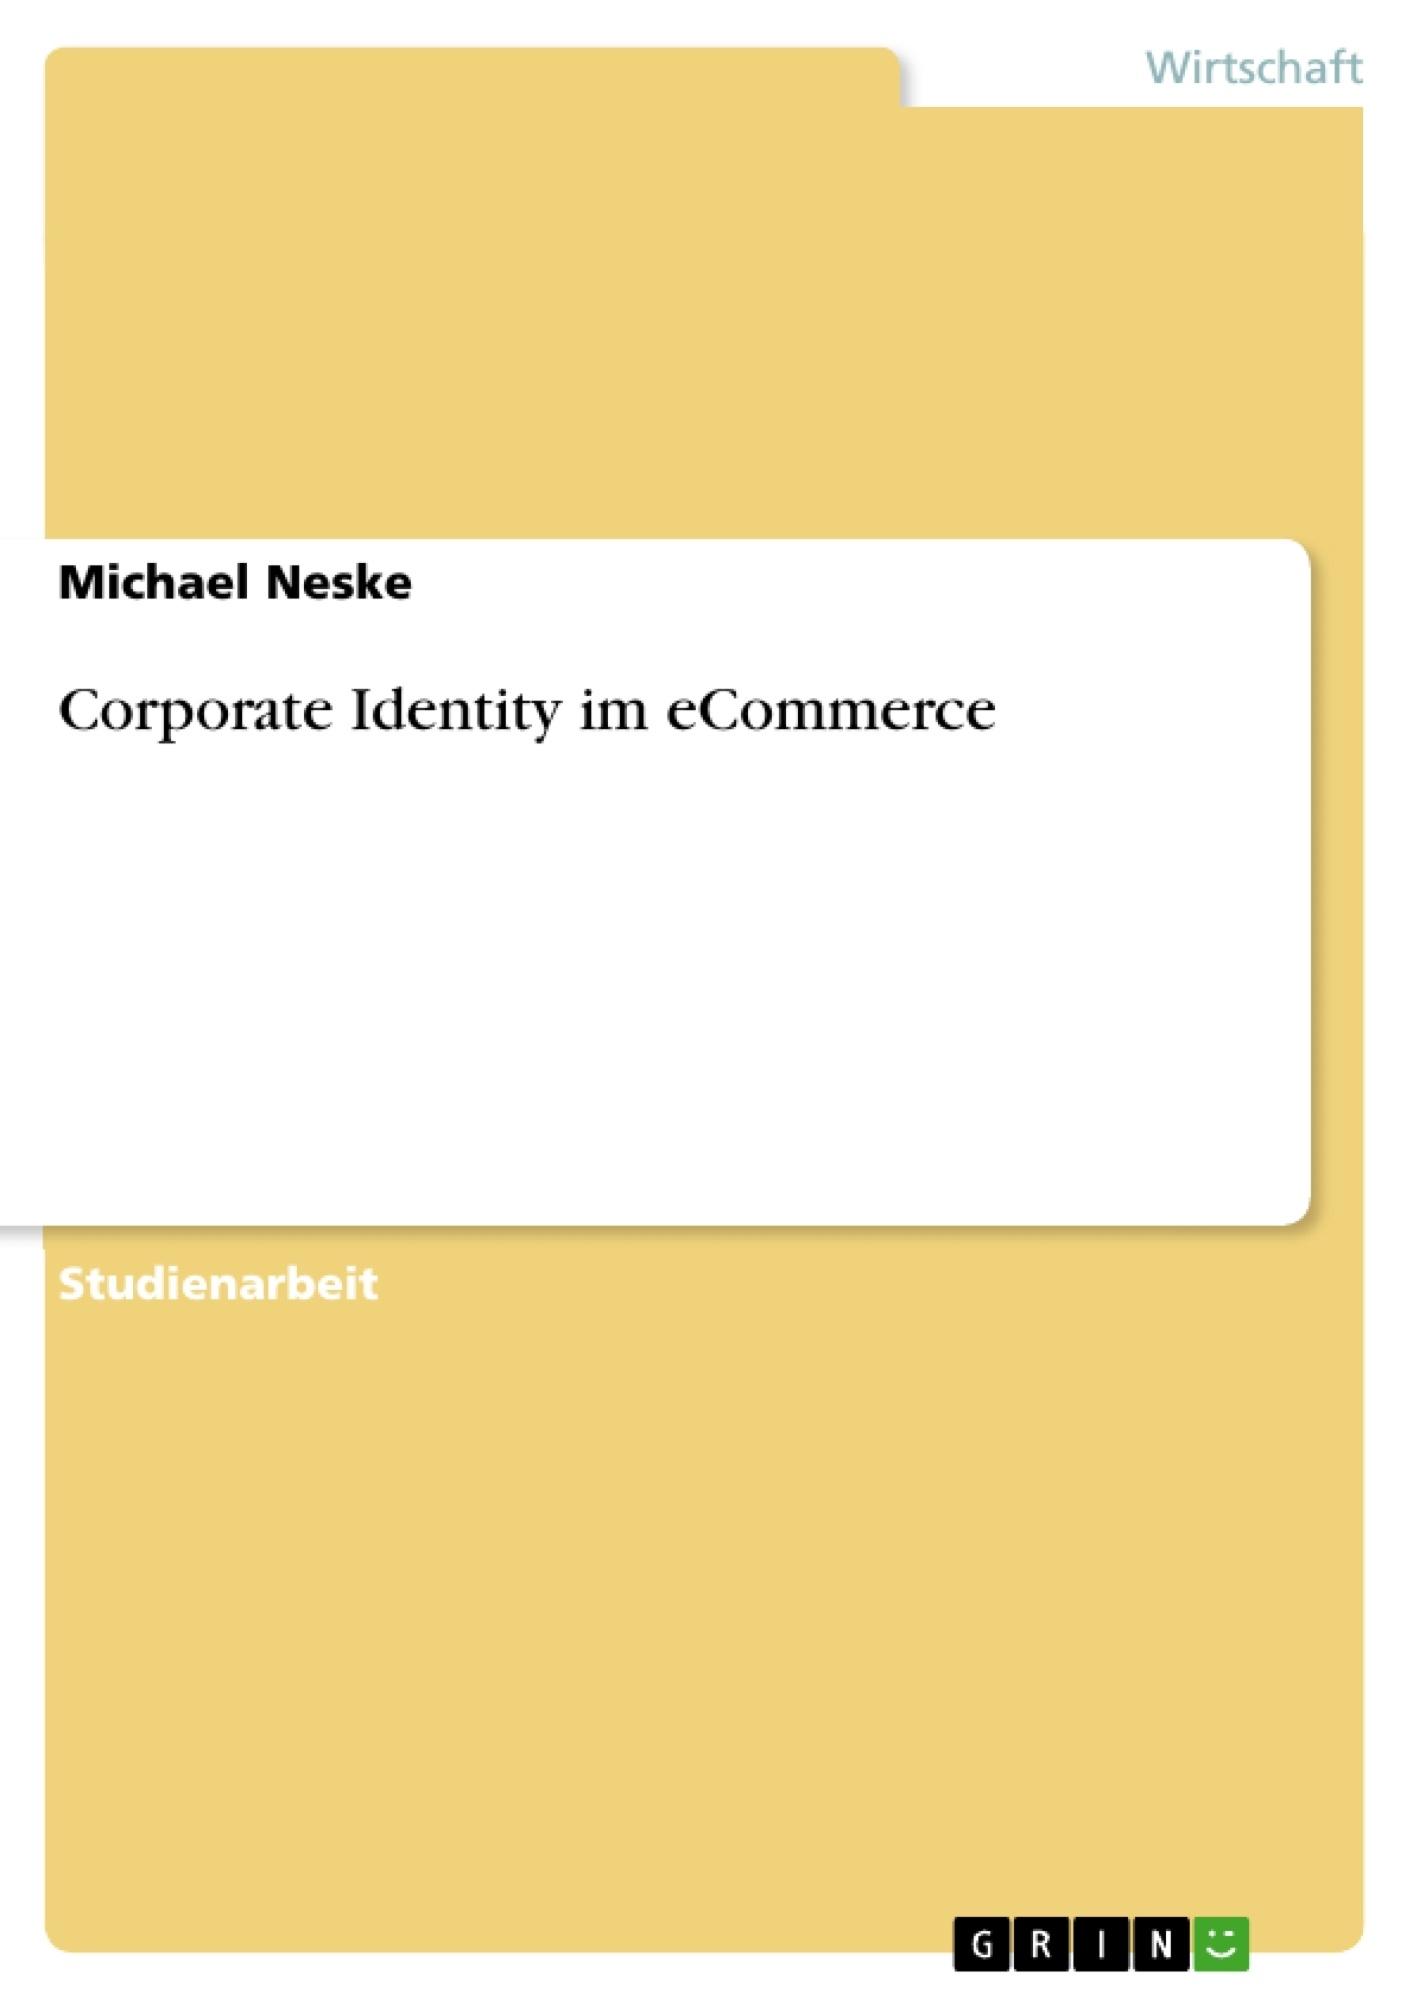 Titel: Corporate Identity im eCommerce